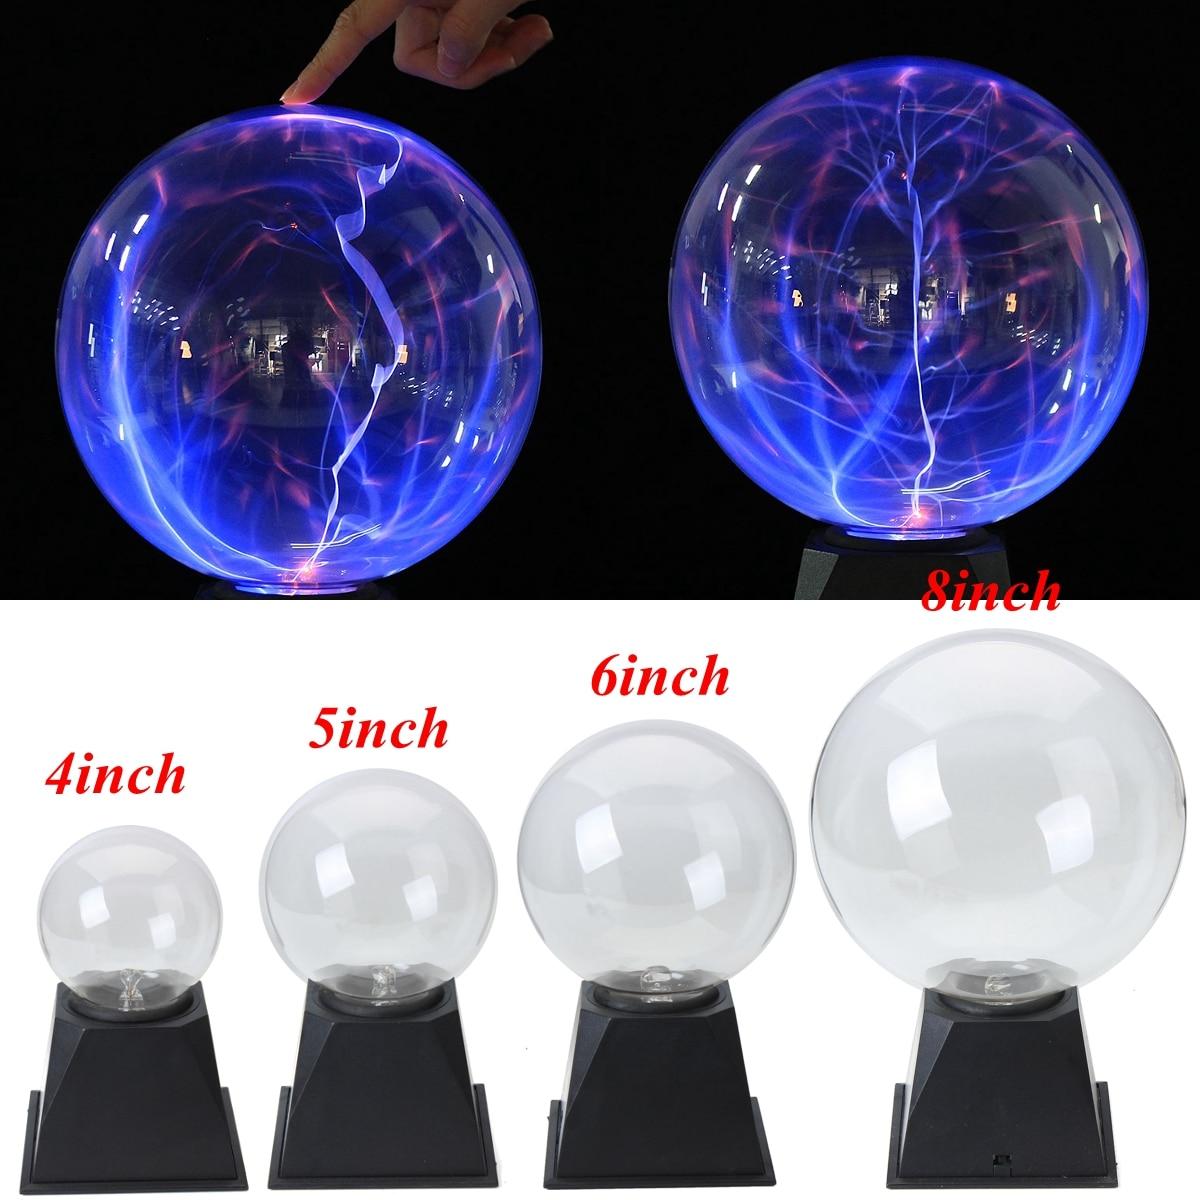 Voice control Glass Magic Plasma Ball Light 4 5 6 8 inch Table Lights Sphere Nightlight Magic Plasma Night Lamp Gift For Kids sphere